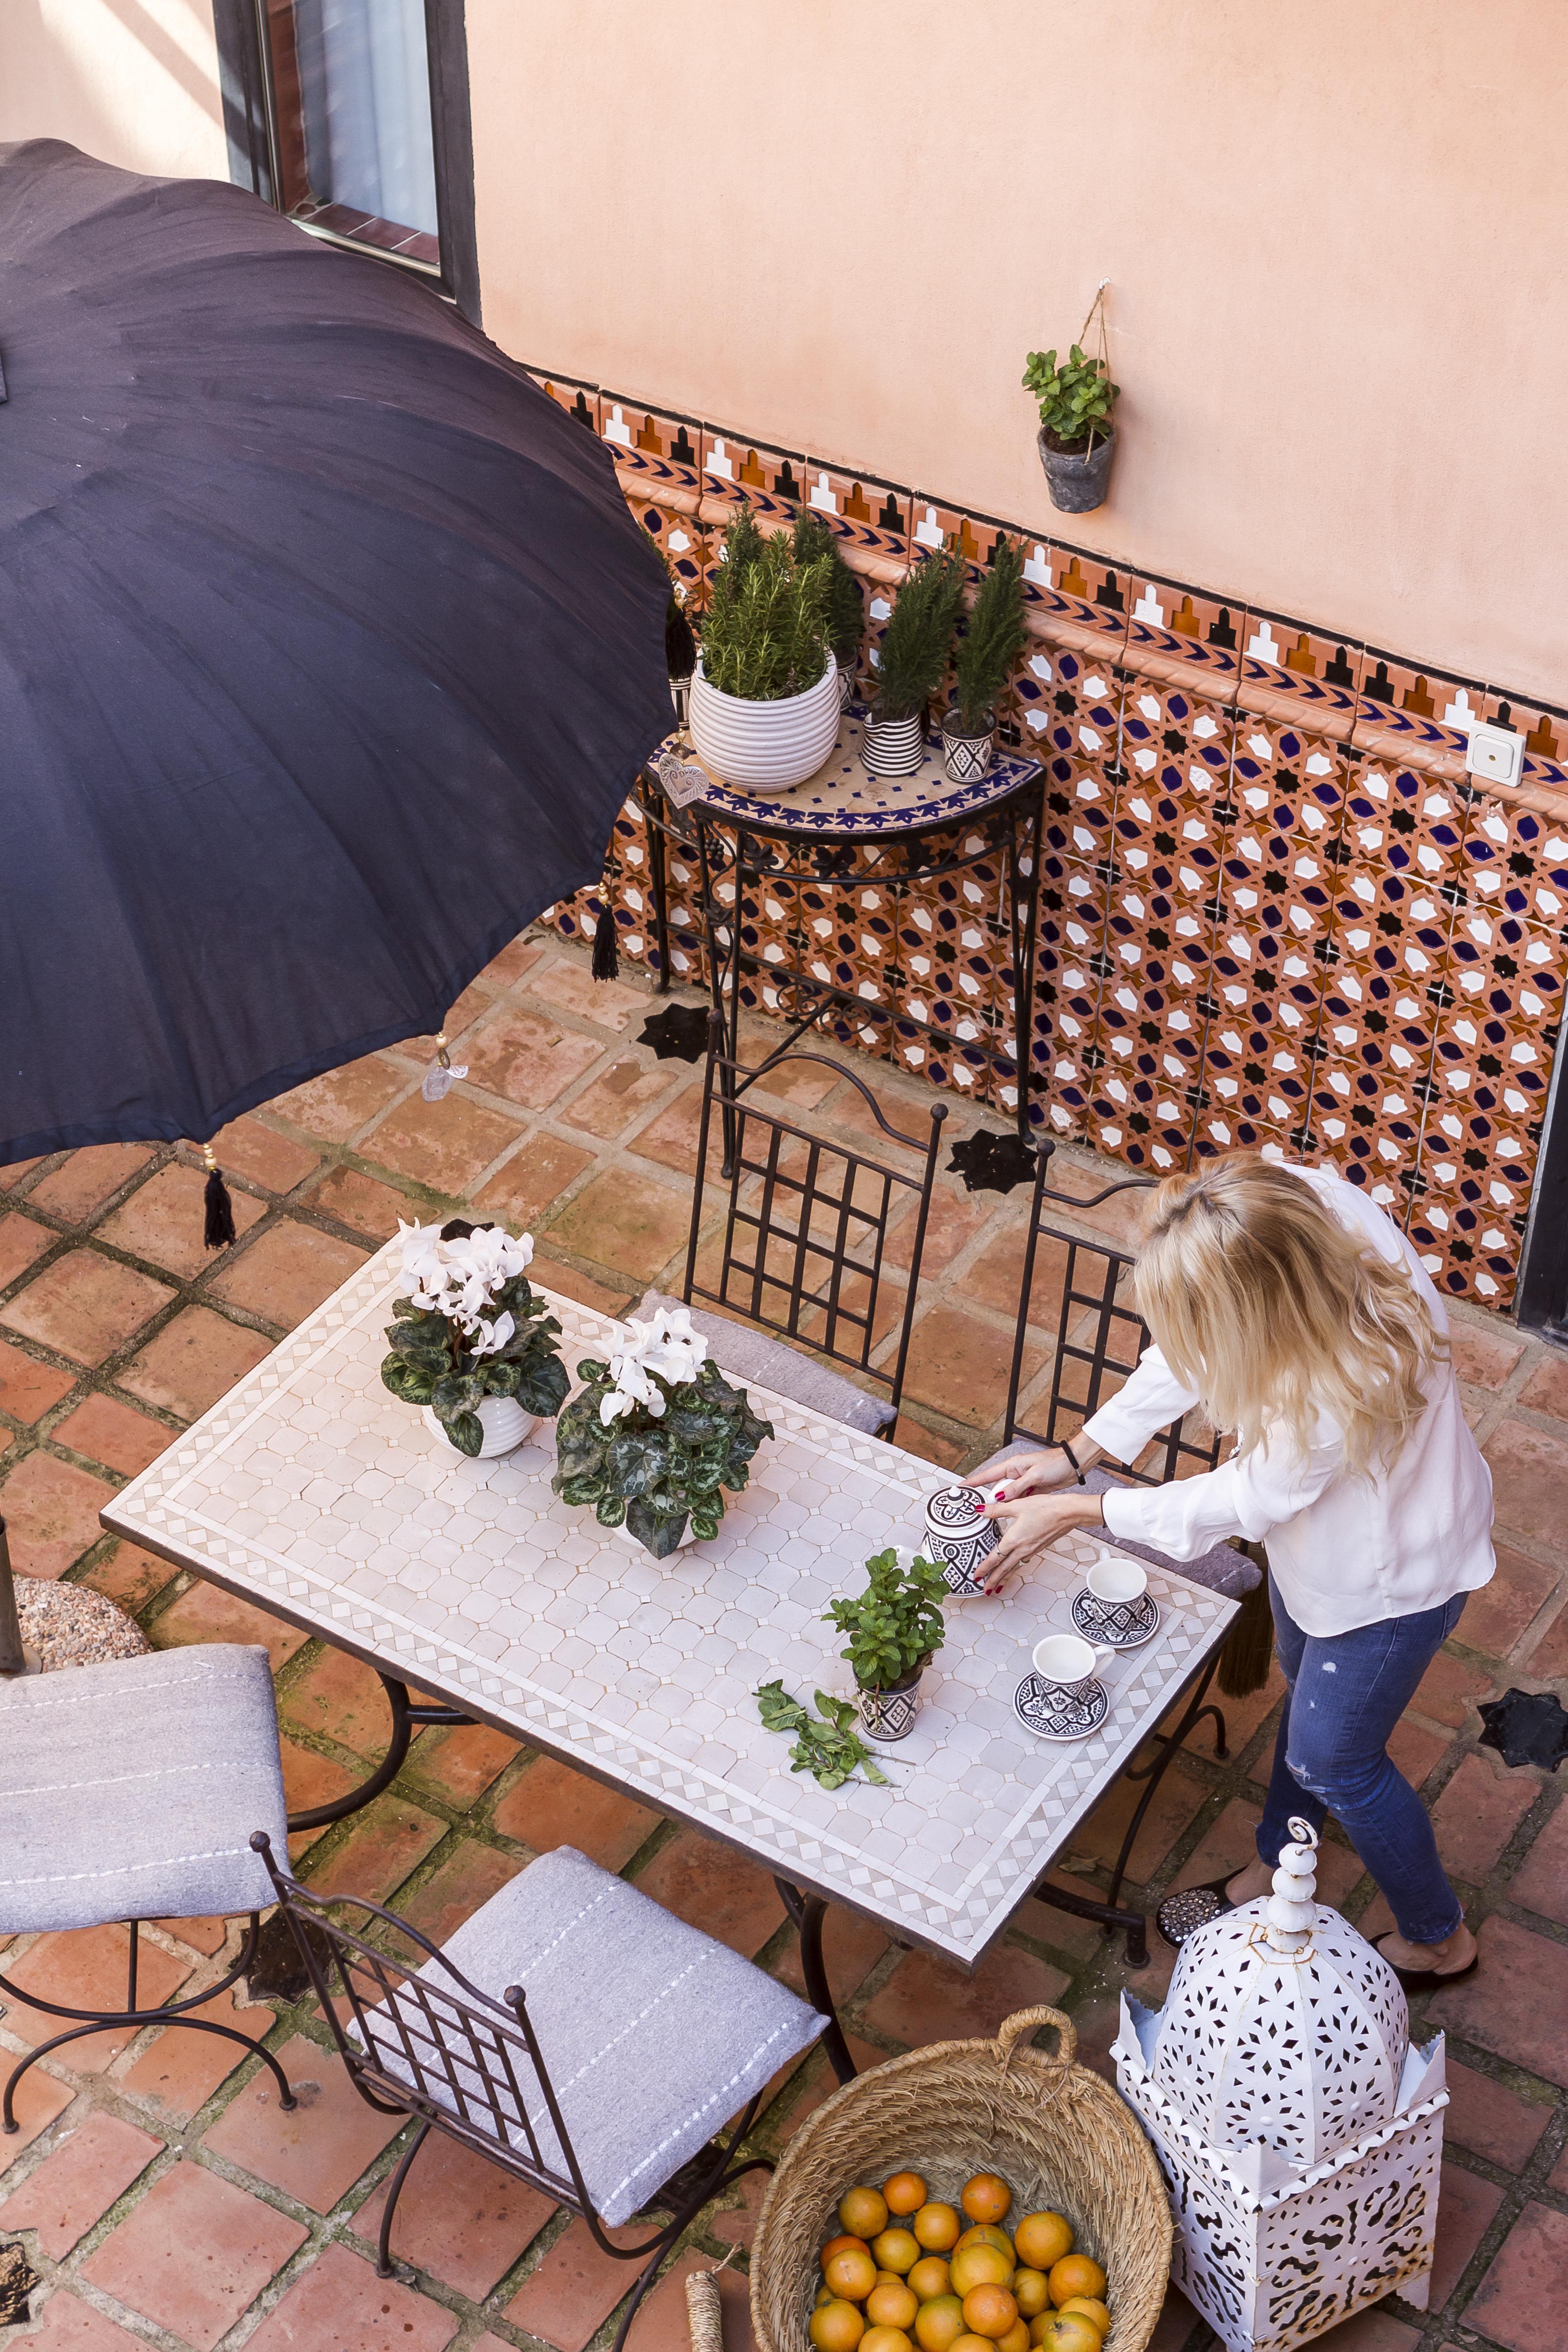 Johanna's patio